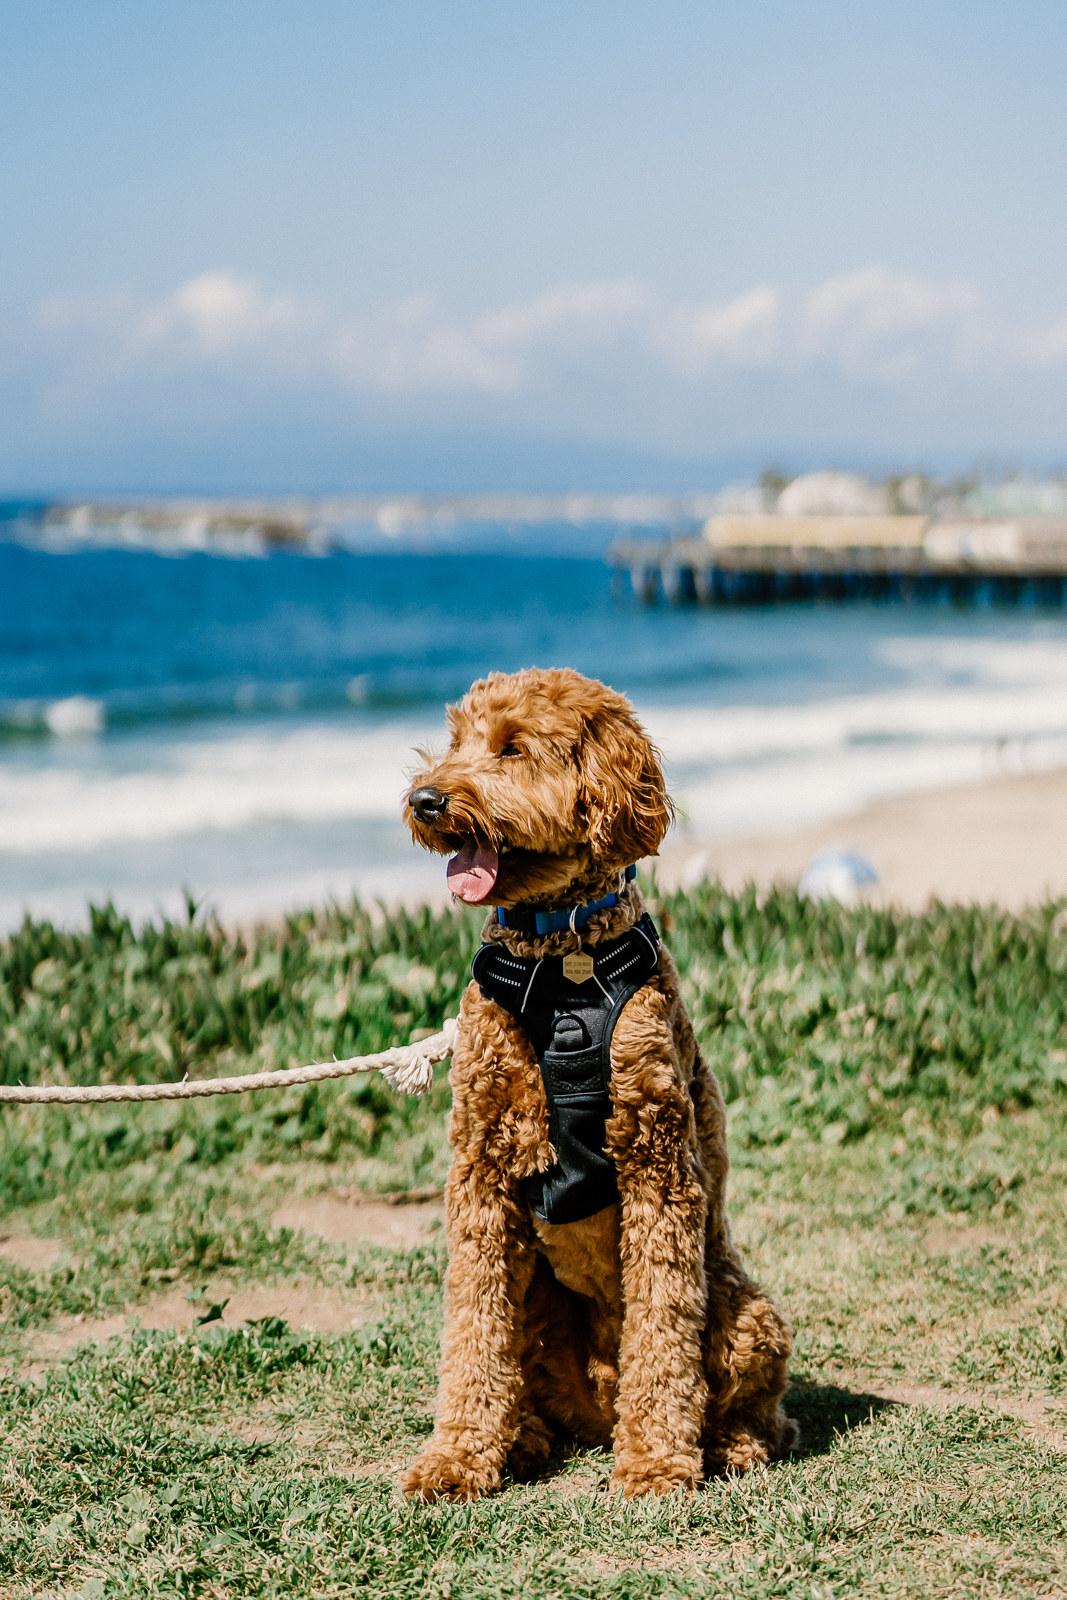 Rush sitting on the beach like a very good boy